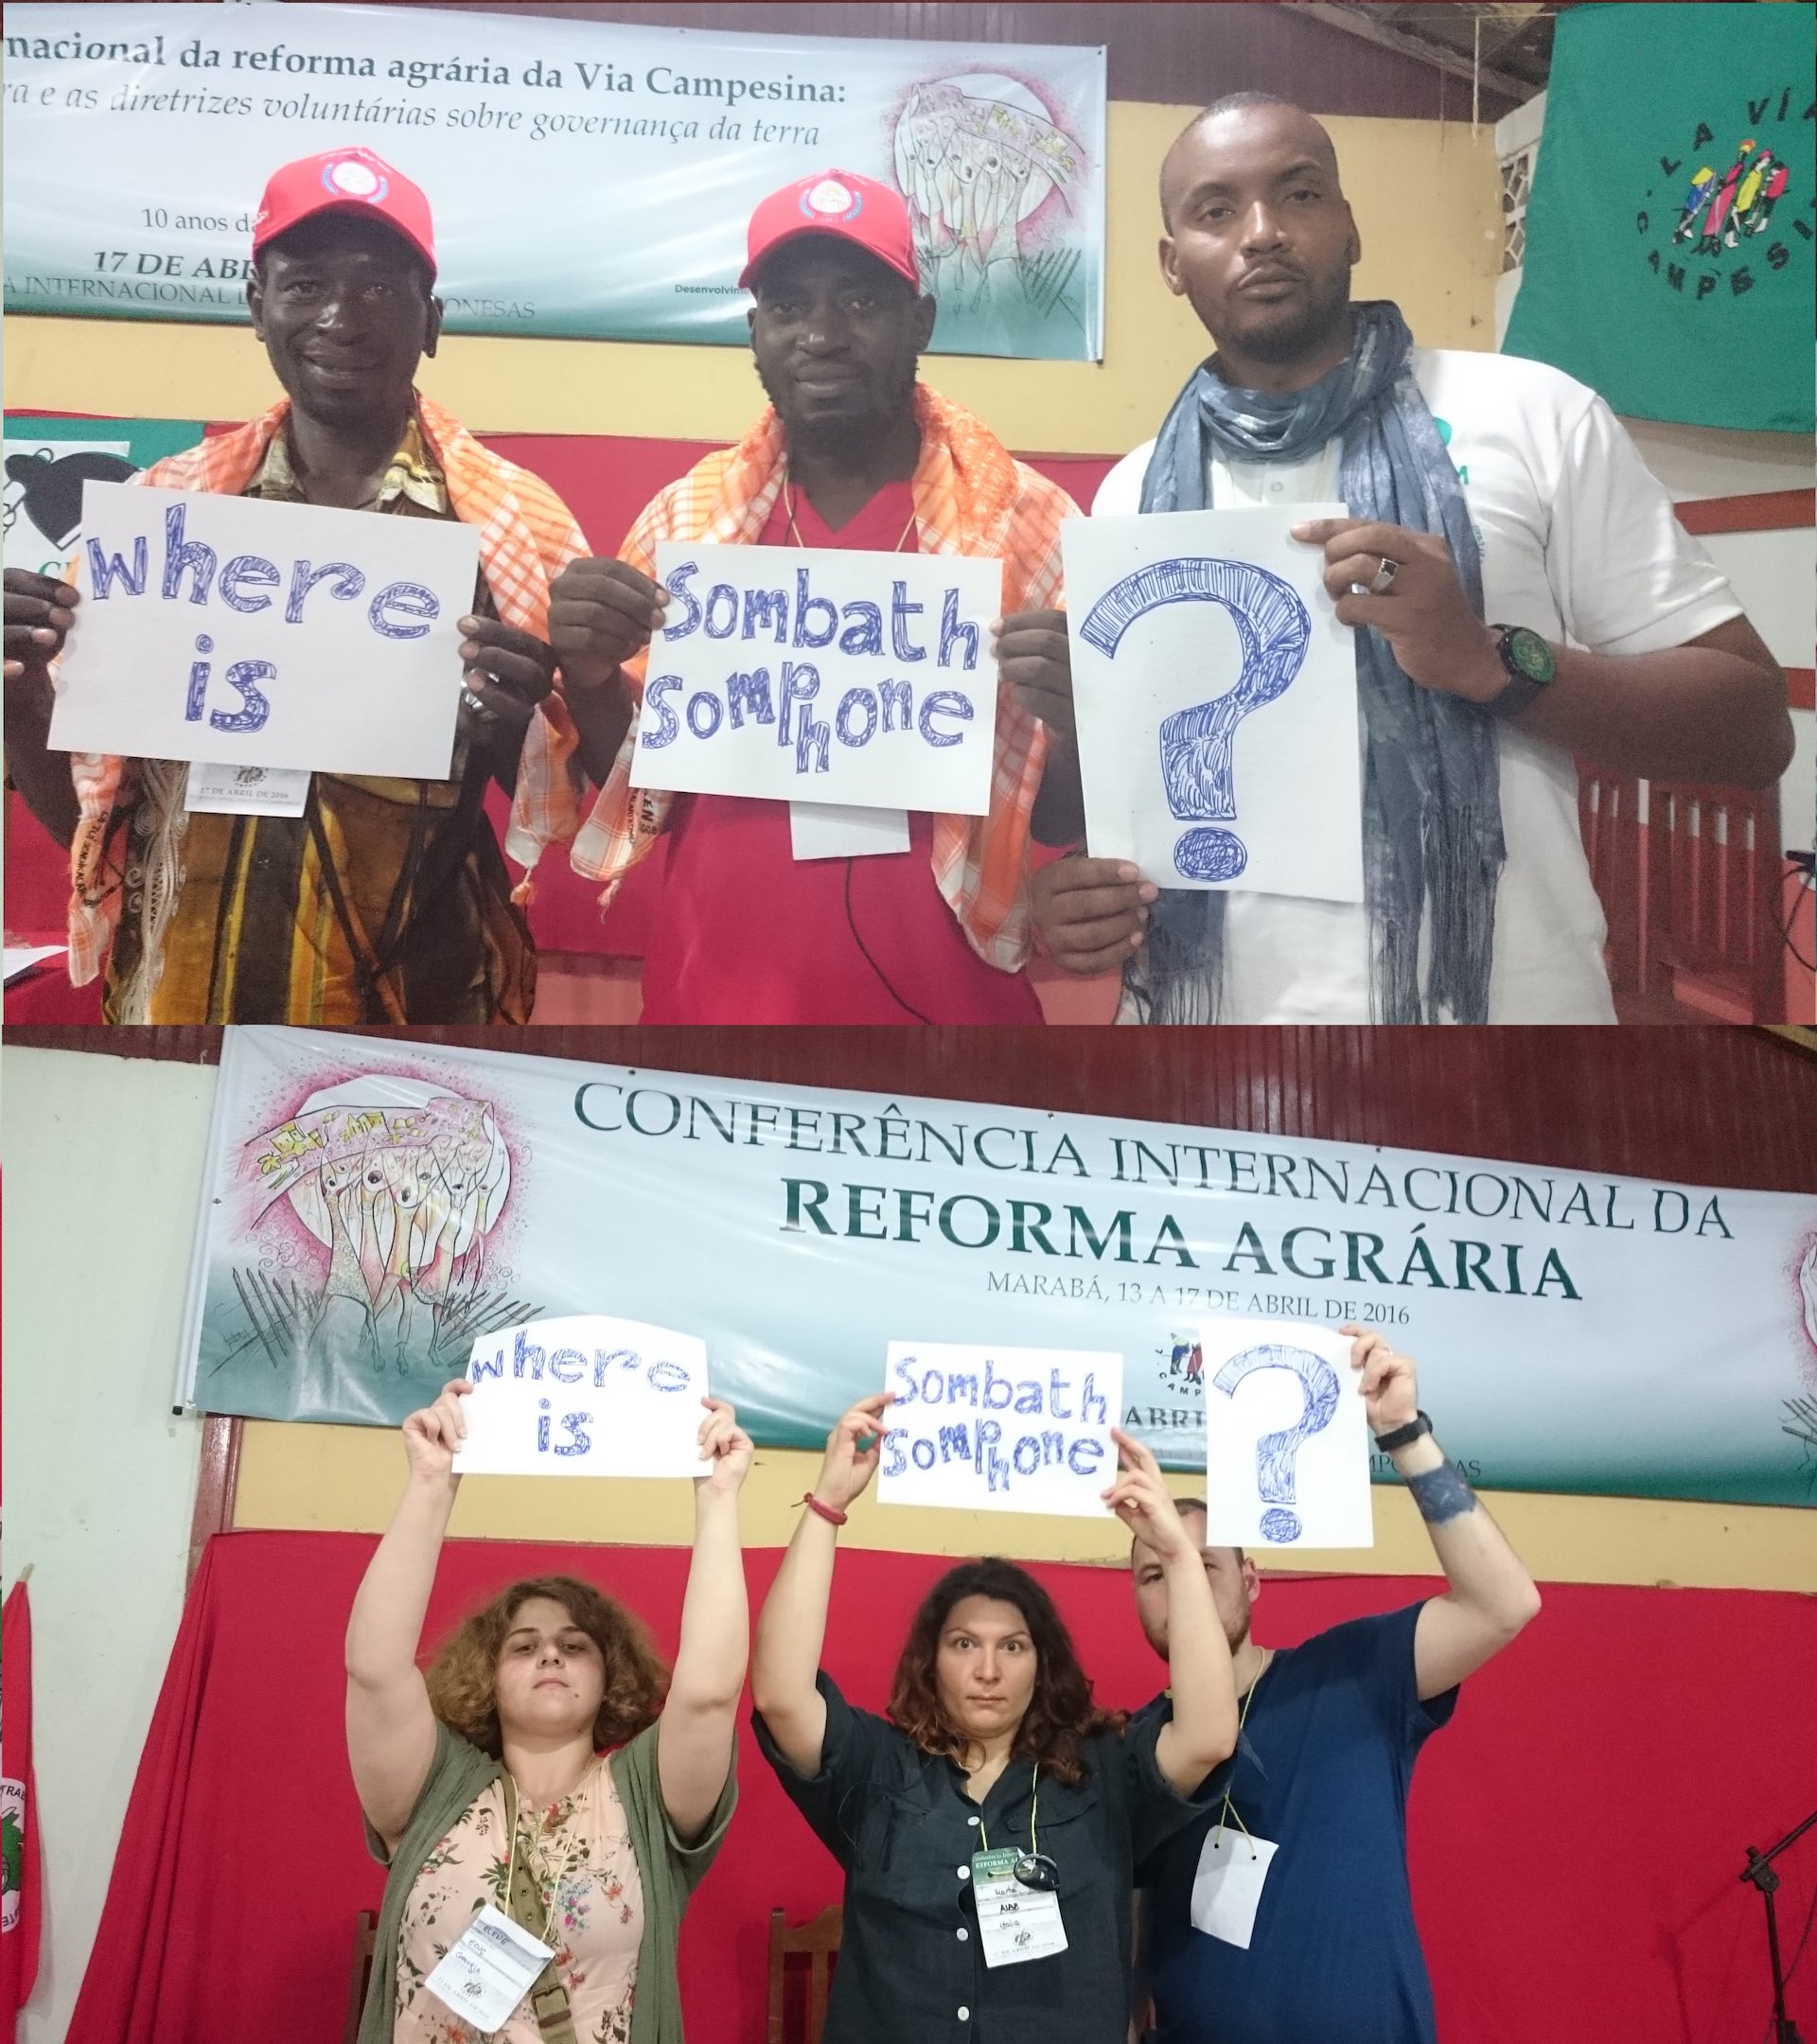 Maraba-International Conference on Agricultural Reform